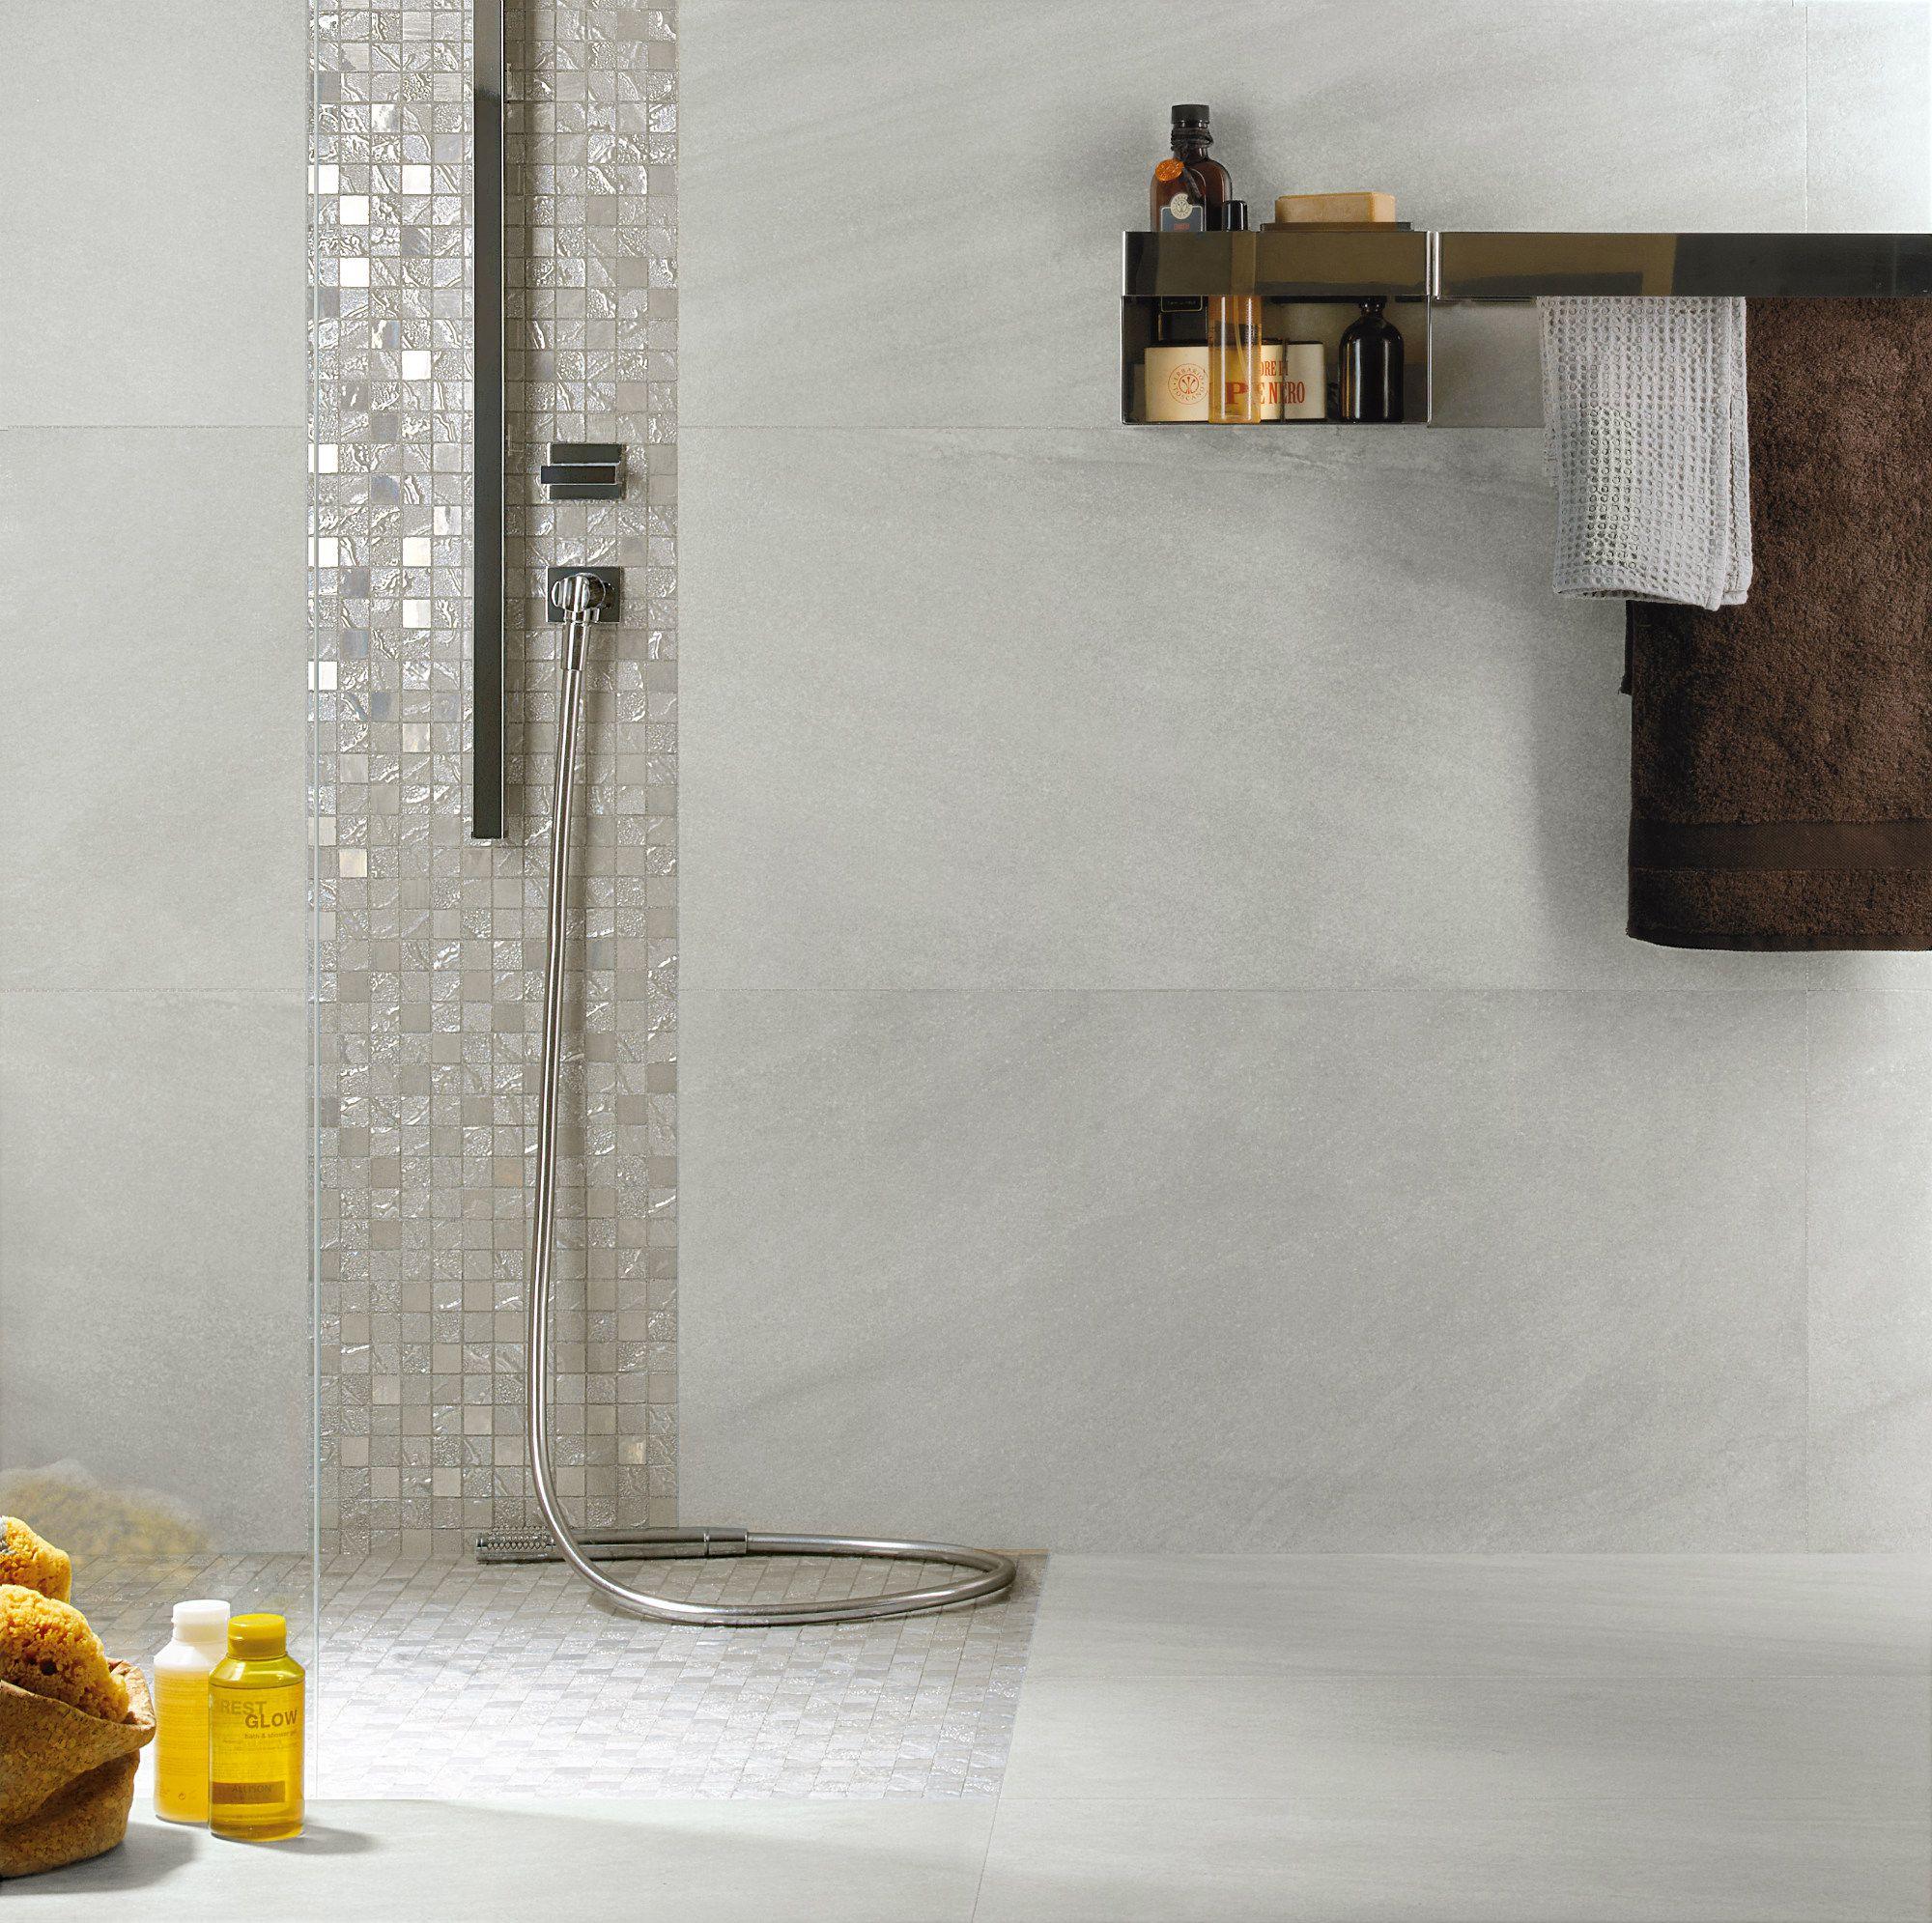 Pearl bathroom tiles - Bathroom Tiling